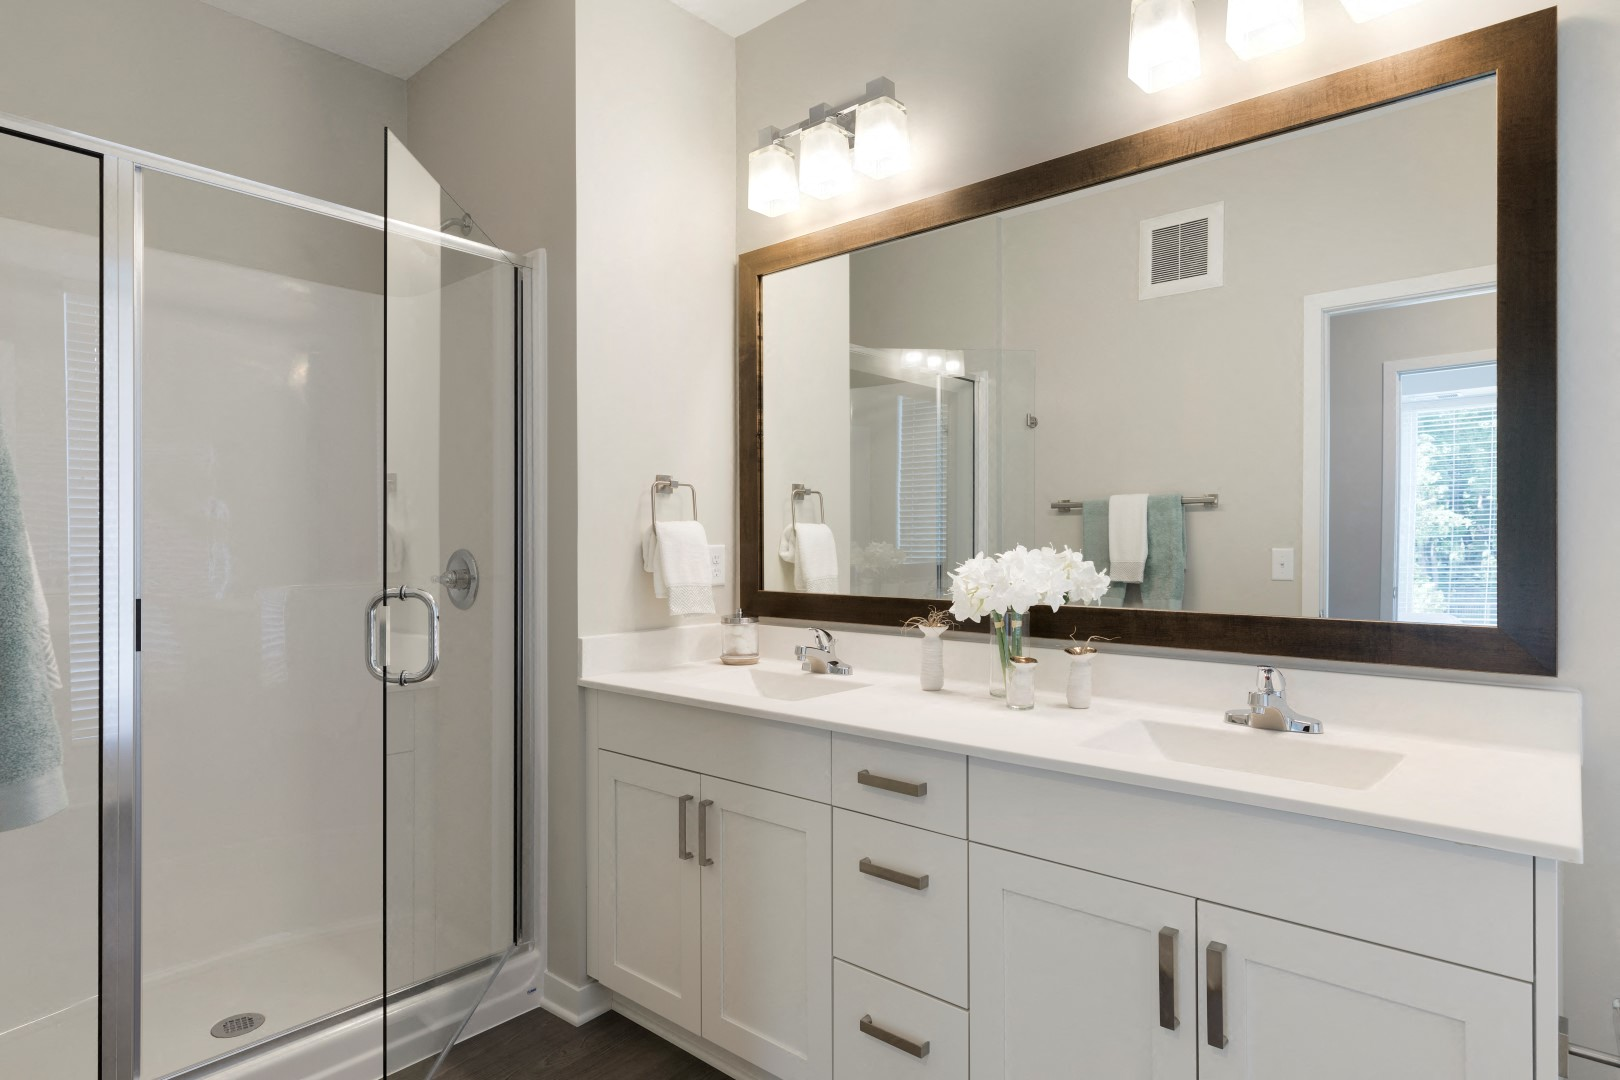 The McMillan Shoreview Model 201 Bathroom